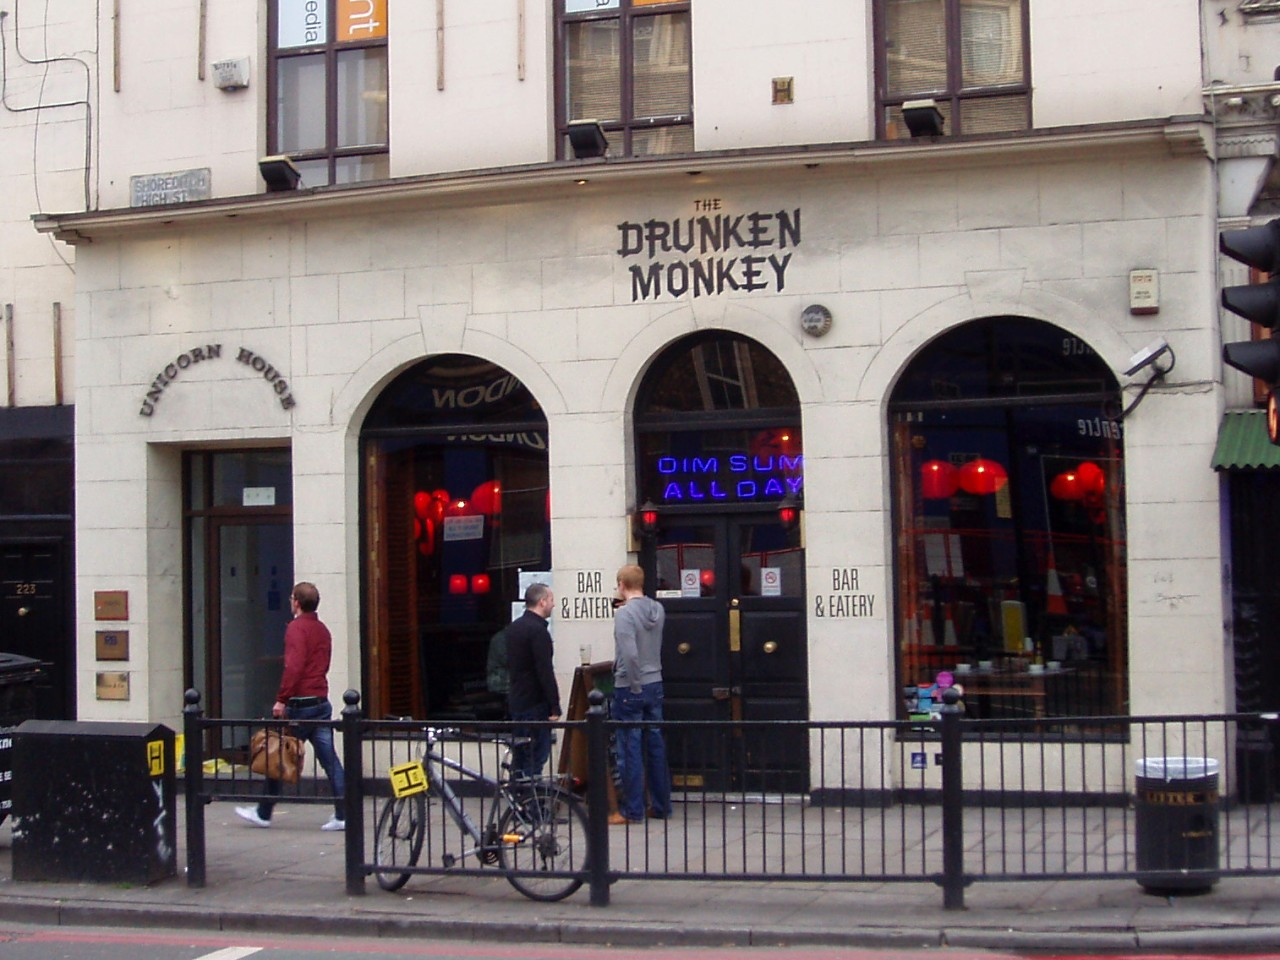 Drunken Monkey, Shoreditch, E1